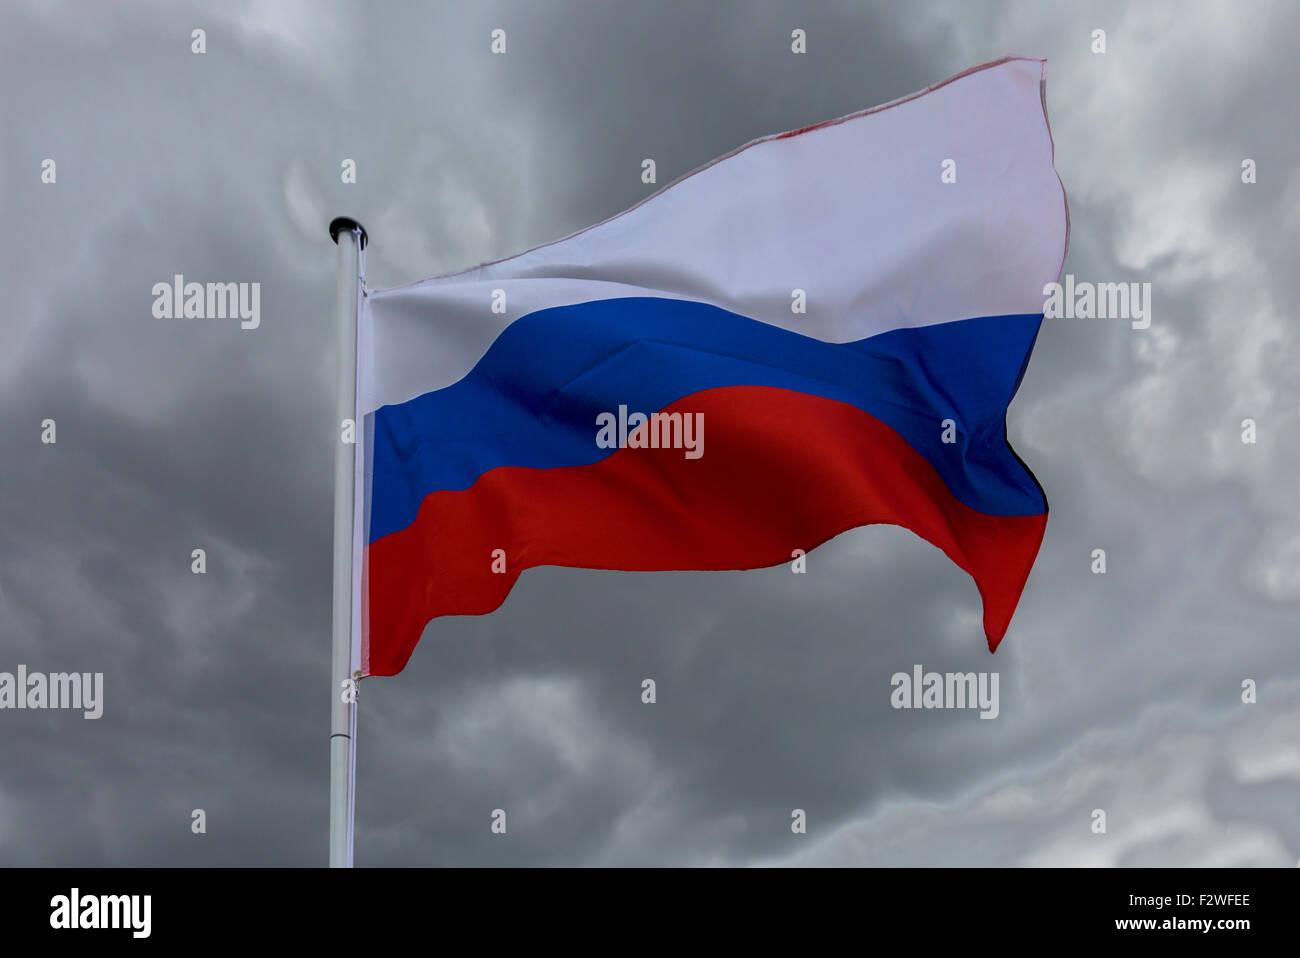 18.04.2015, Berlin, Berlin, Germany - Flag of Russian Federation waving in the wind. 0MK150416D028CAROEX.JPG - NOT - Stock Image